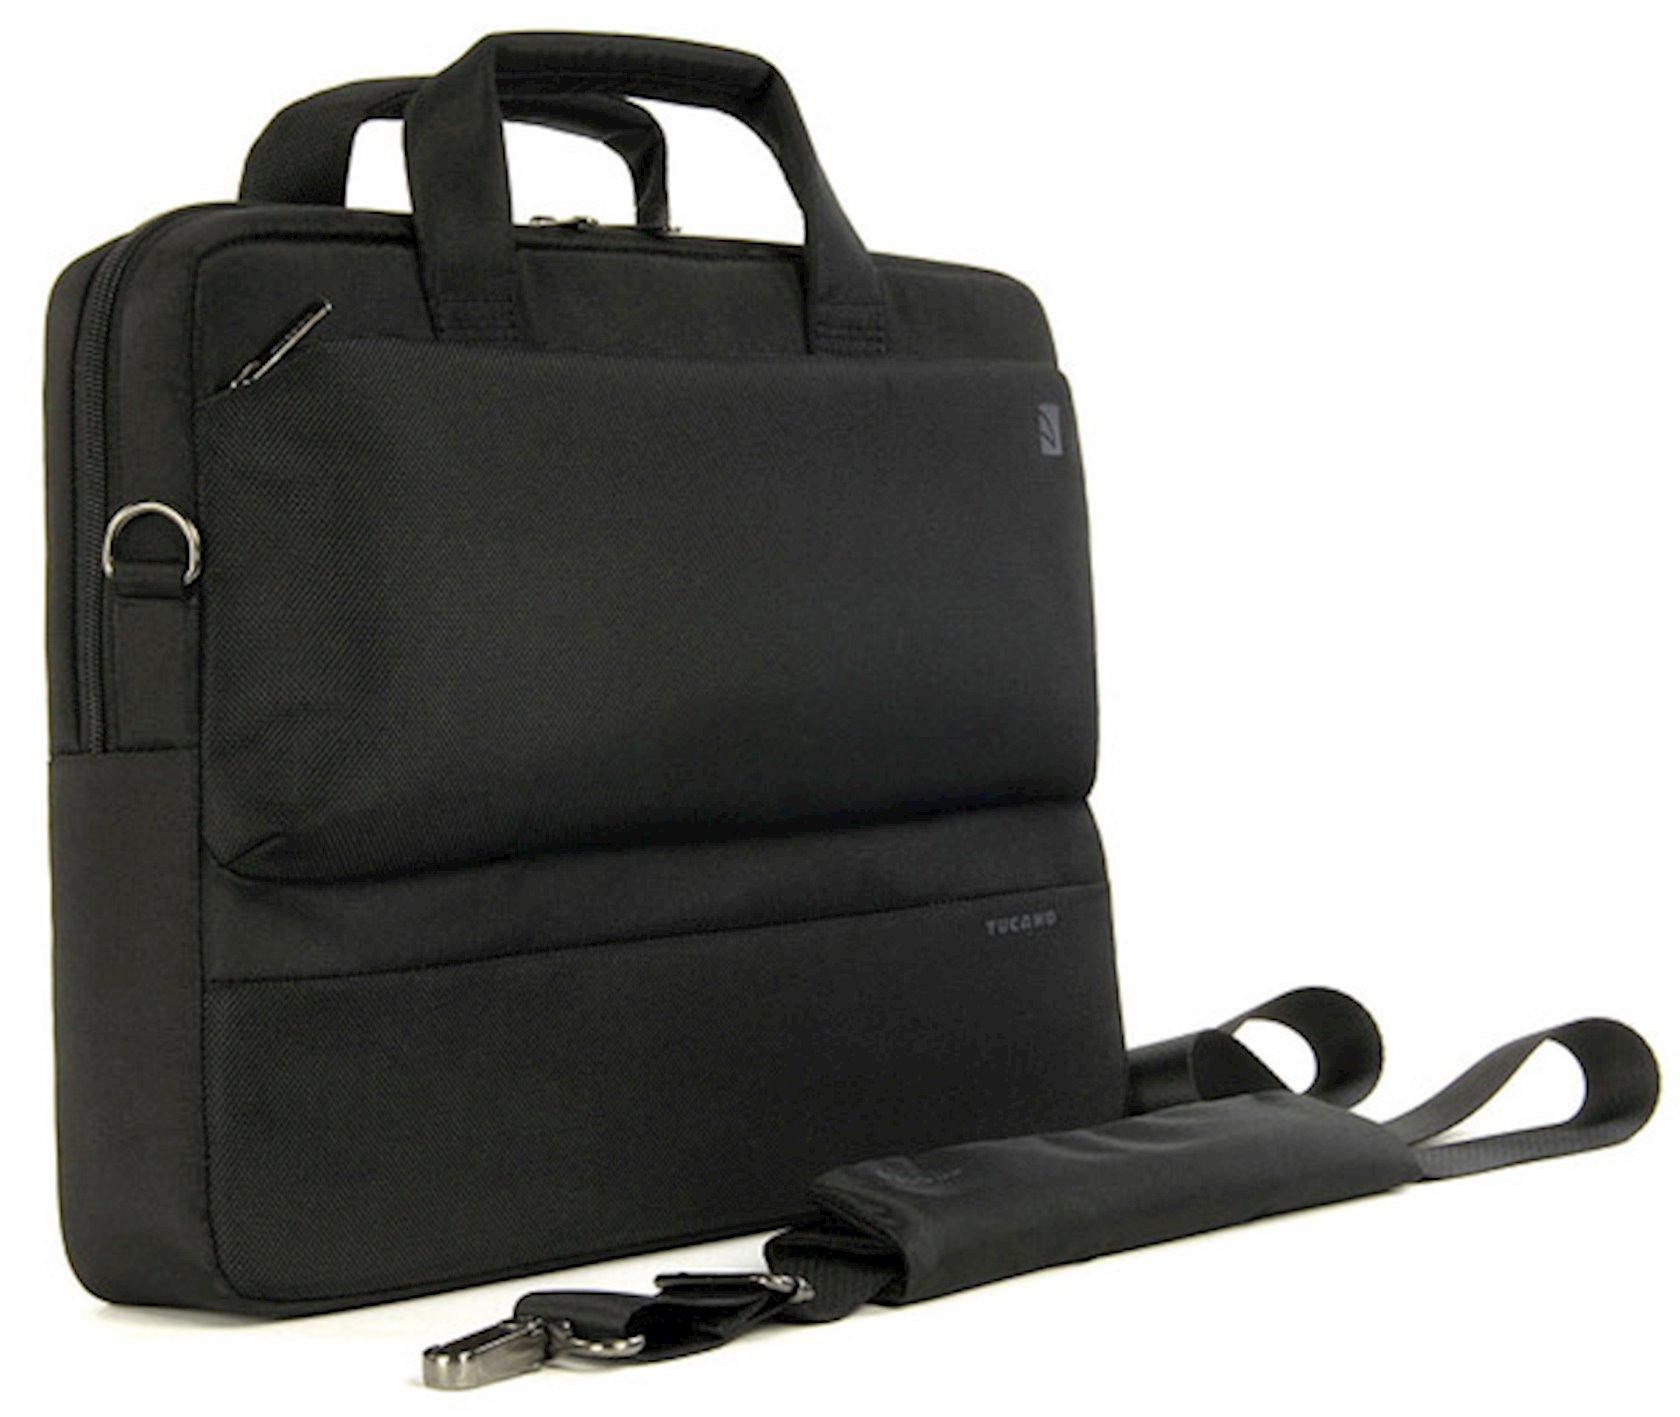 Noutbuk üçün çanta Tucano Dritta Slim Bag 13/14 Black